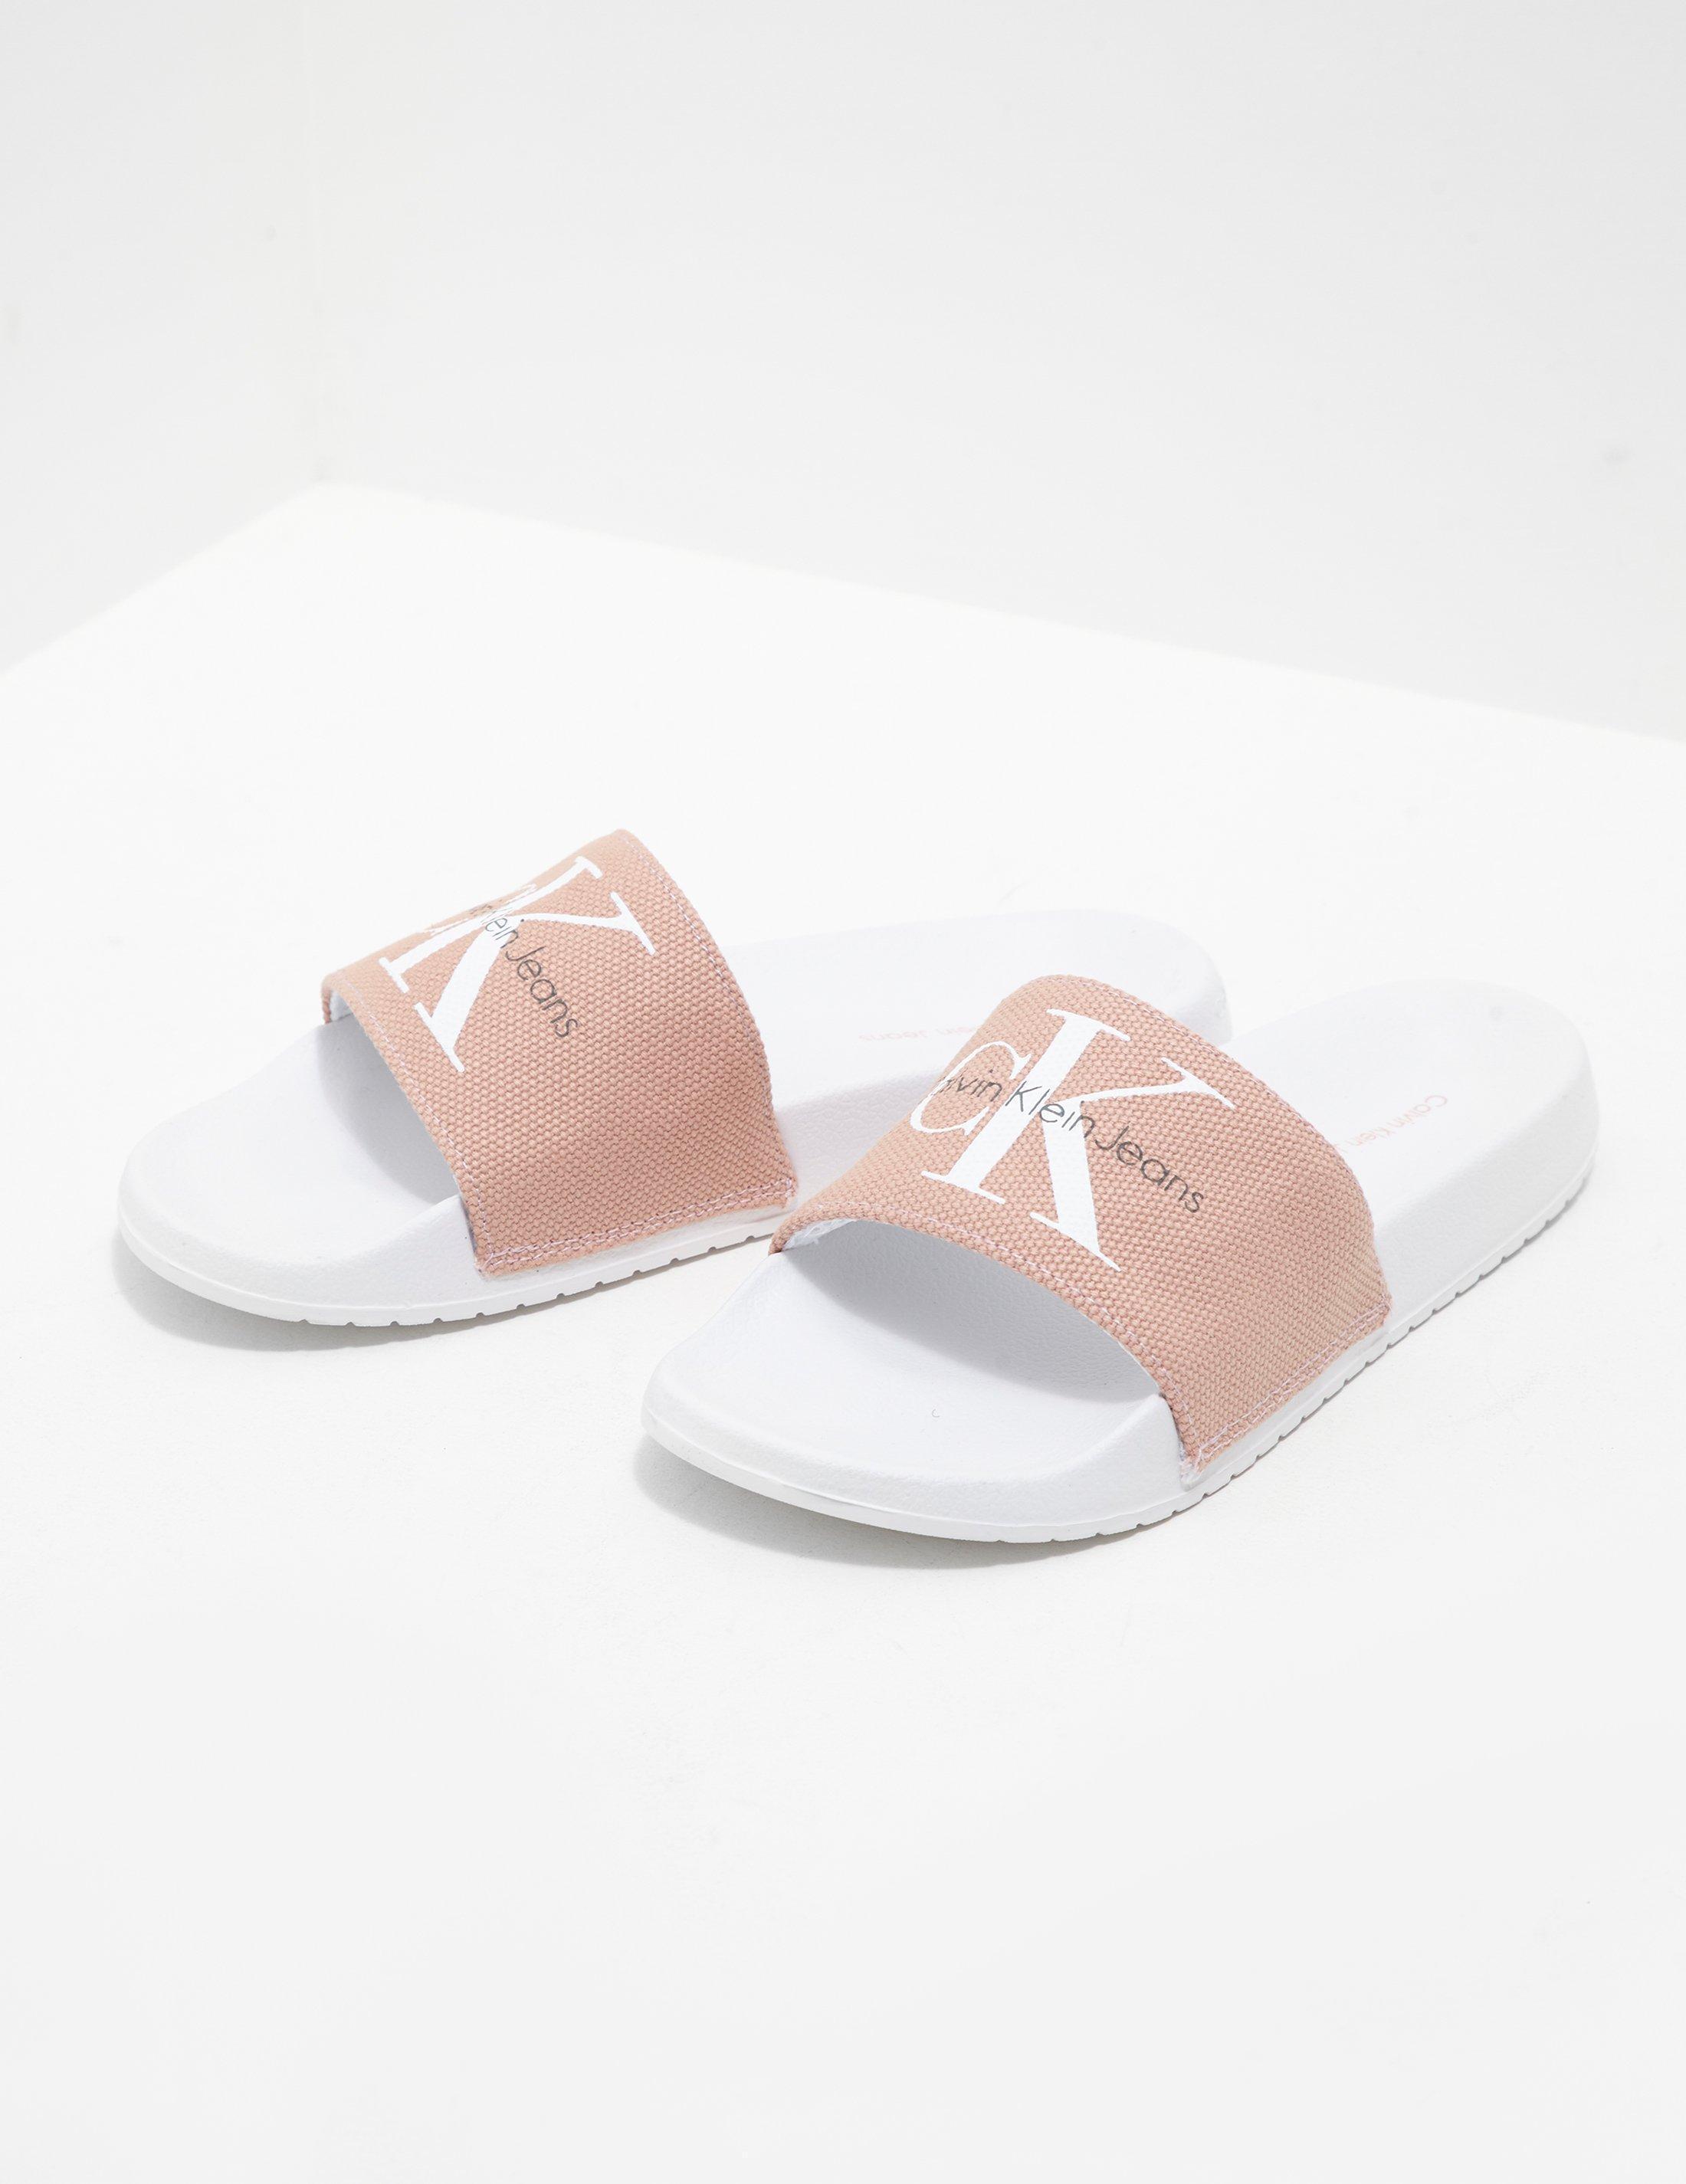 e0a5a7396c1 Lyst - Calvin Klein Chantal Slides Women s Pink in Pink - Save 5%